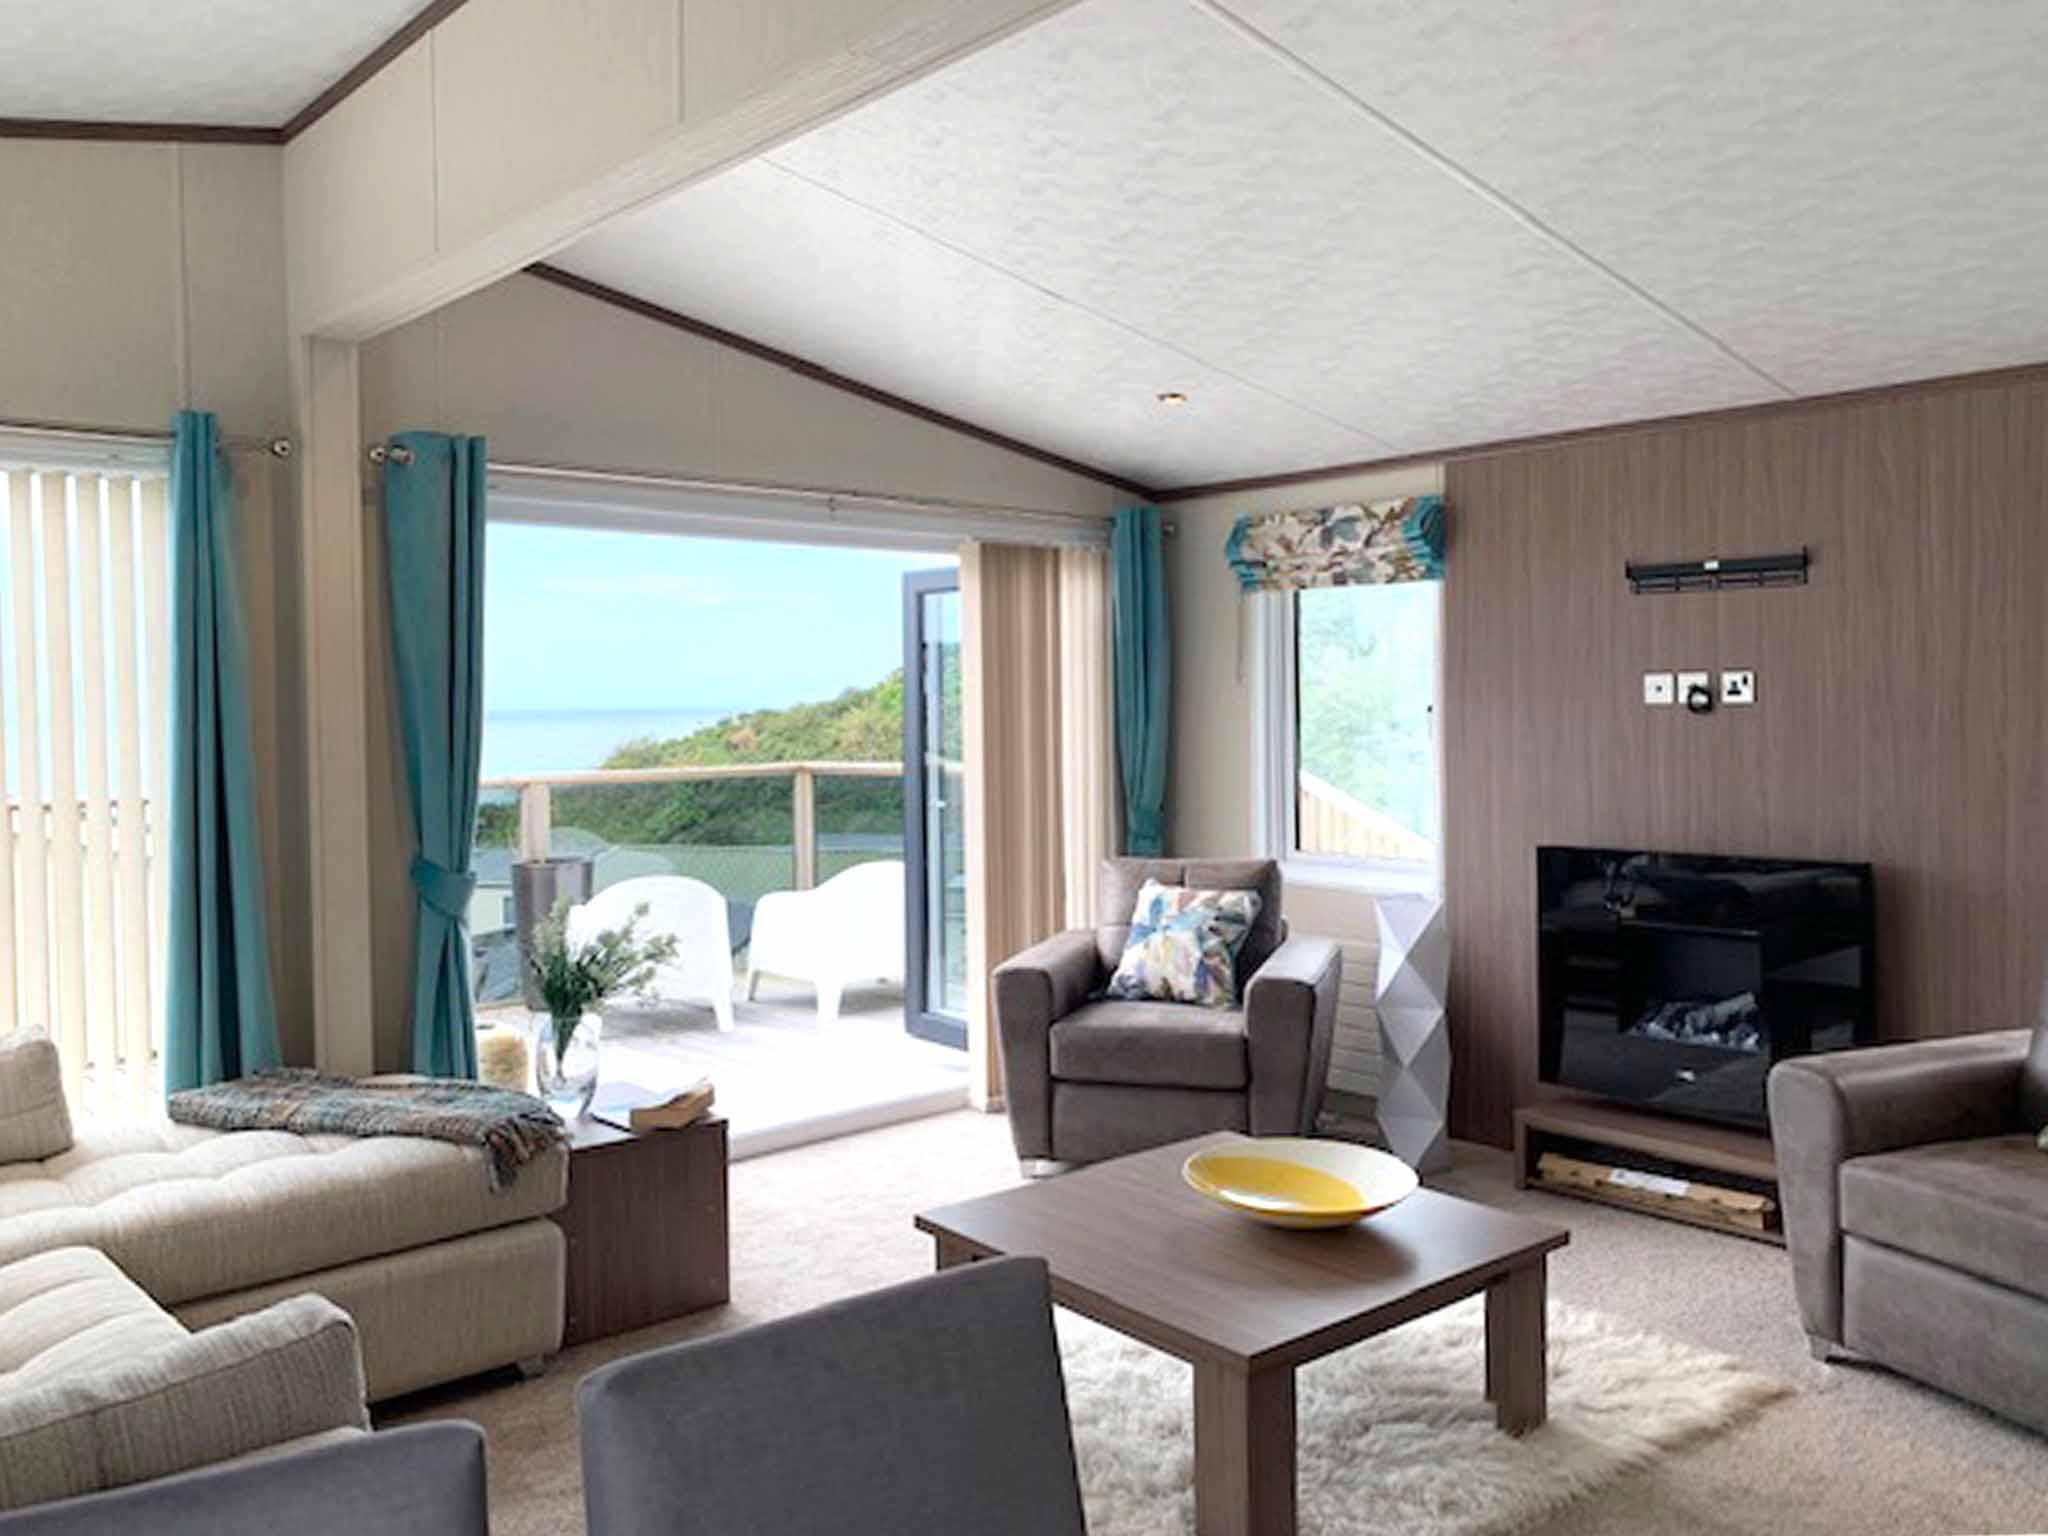 Pemberton Arrondale lodge lounge Gwalia Falls Retreat Tresaith Beach